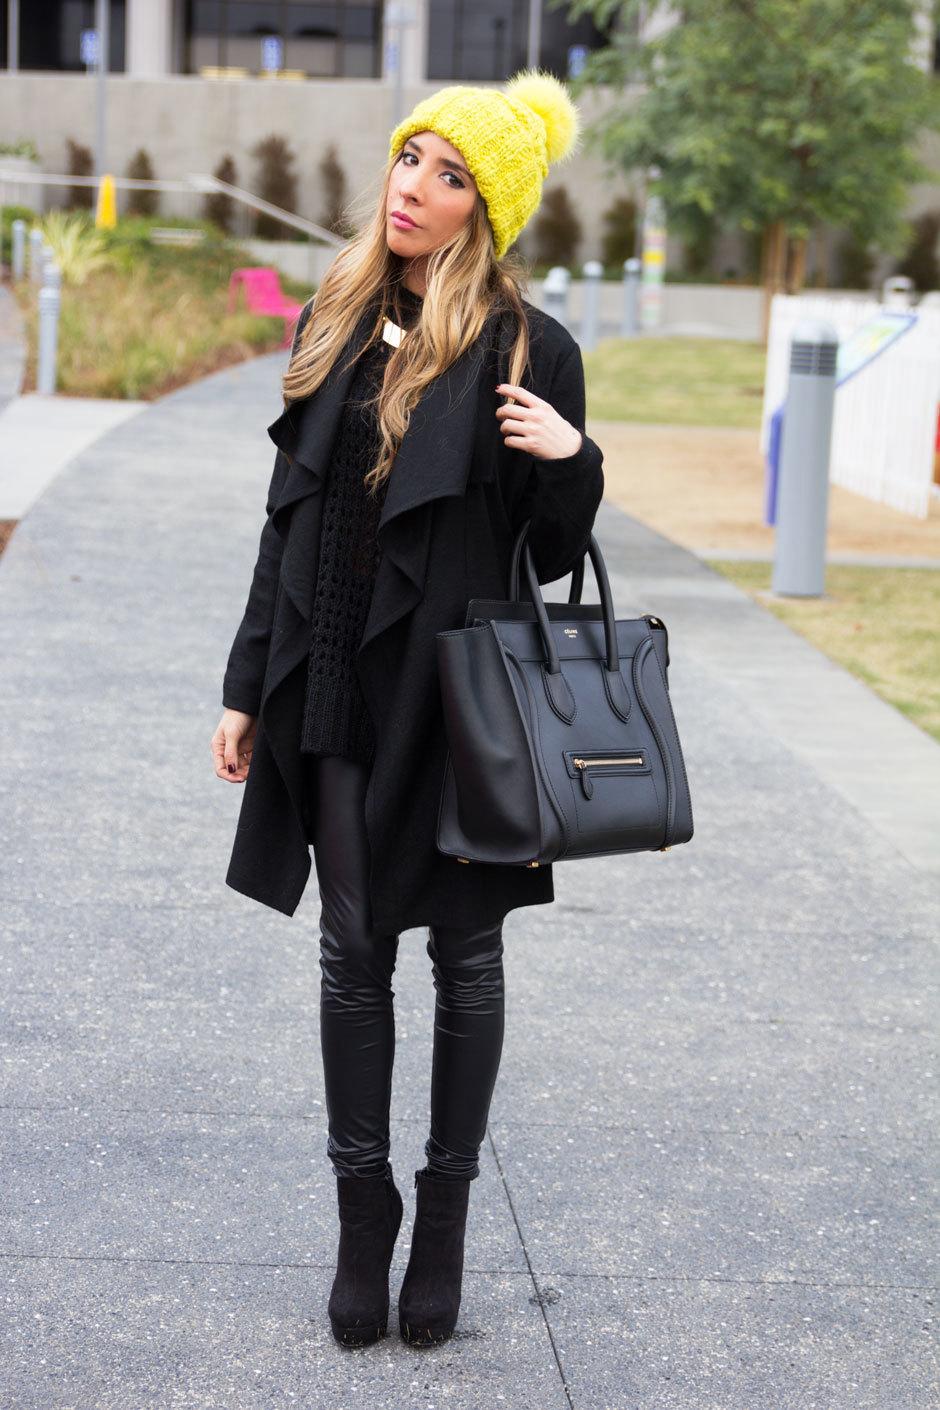 Womens Black Coat Black Knit Oversized Sweater Black Leather